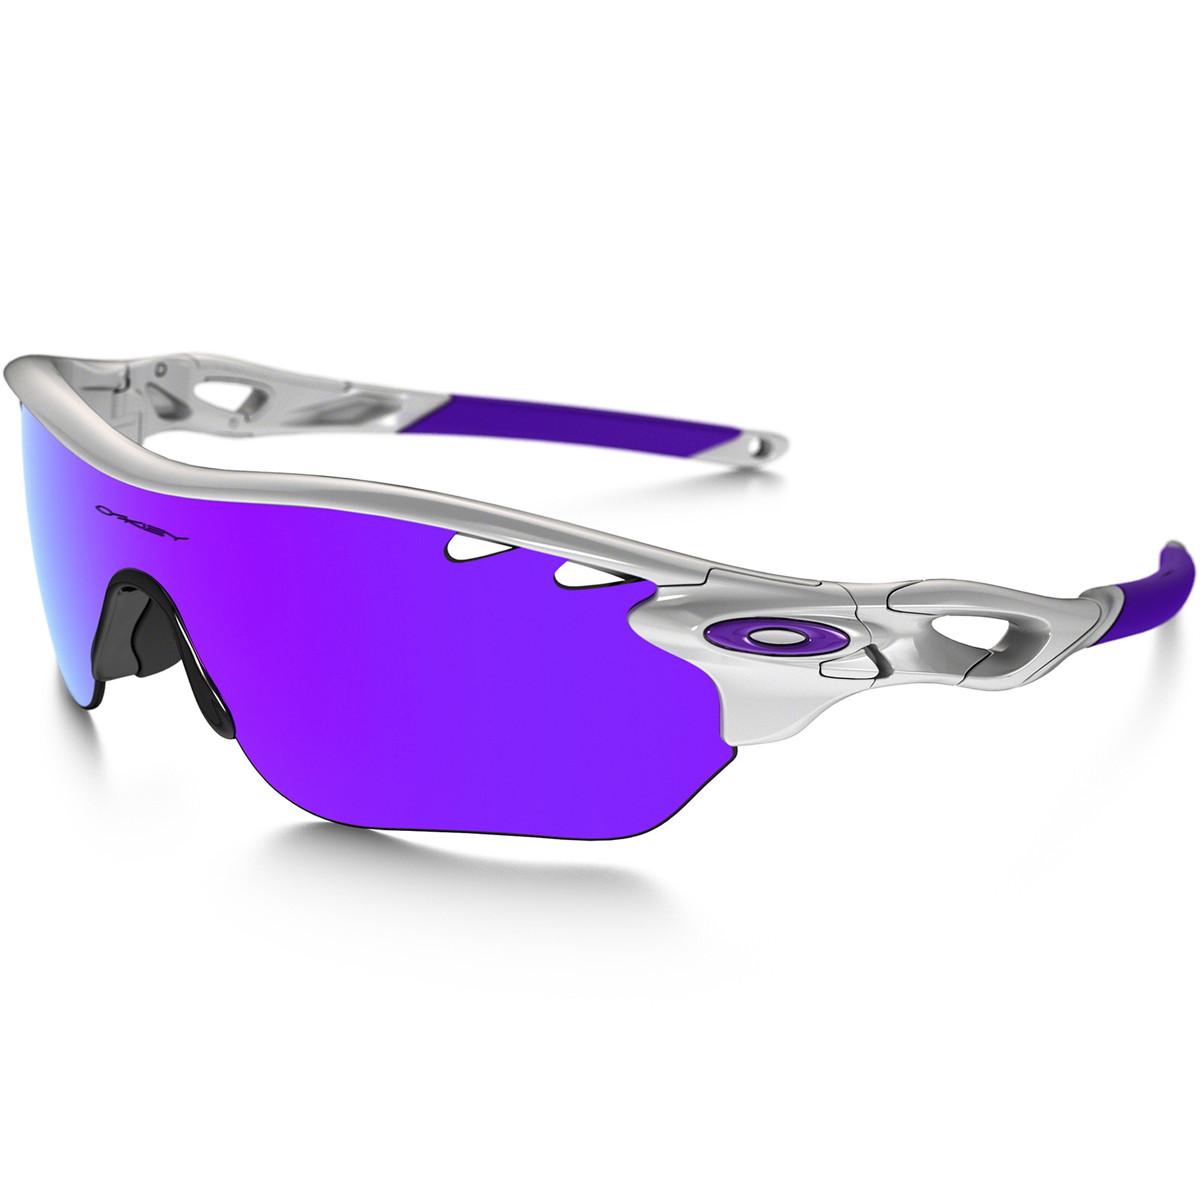 Óculos Oakley Radarlock Edge Vented Polished White Lentes Violet Iridium e  Clear VR28 d35ee80d2b